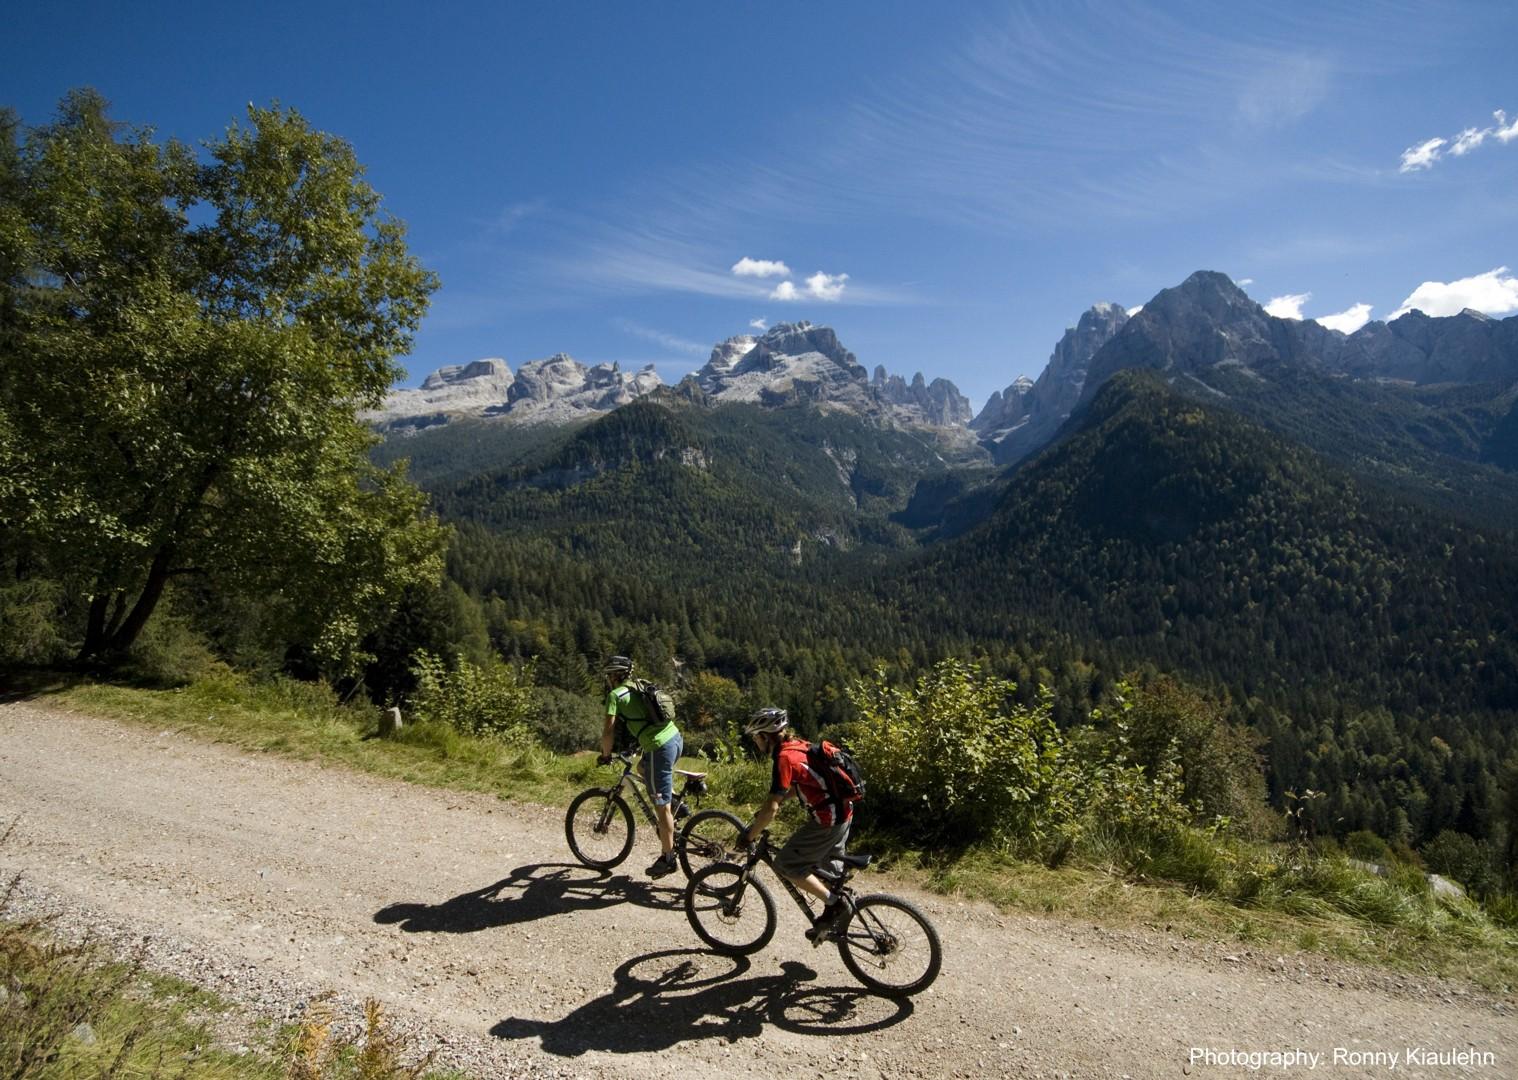 dolomites2.jpg - Italy - Dolomites of Brenta - Guided Mountain Bike Holiday - Mountain Biking